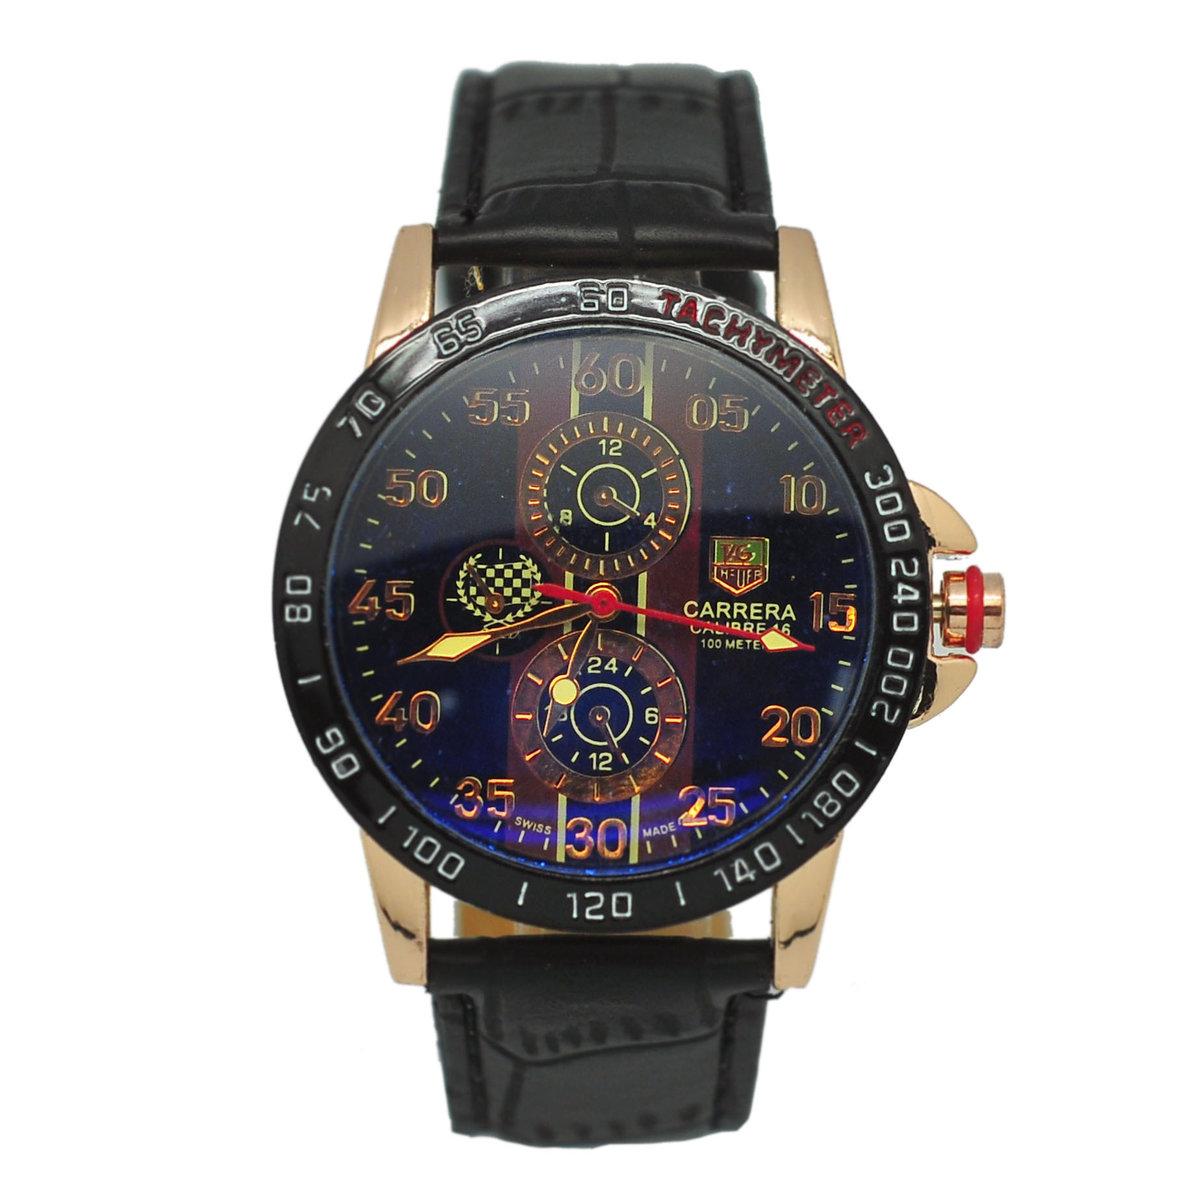 Обзор модели tag heuer: grand carrera calibre часы tag heuer grand carrera calibre мужские часы tag heuer grand carrera calibre часы tag heuer: grand carrera calibre 36 (видео-обзор).